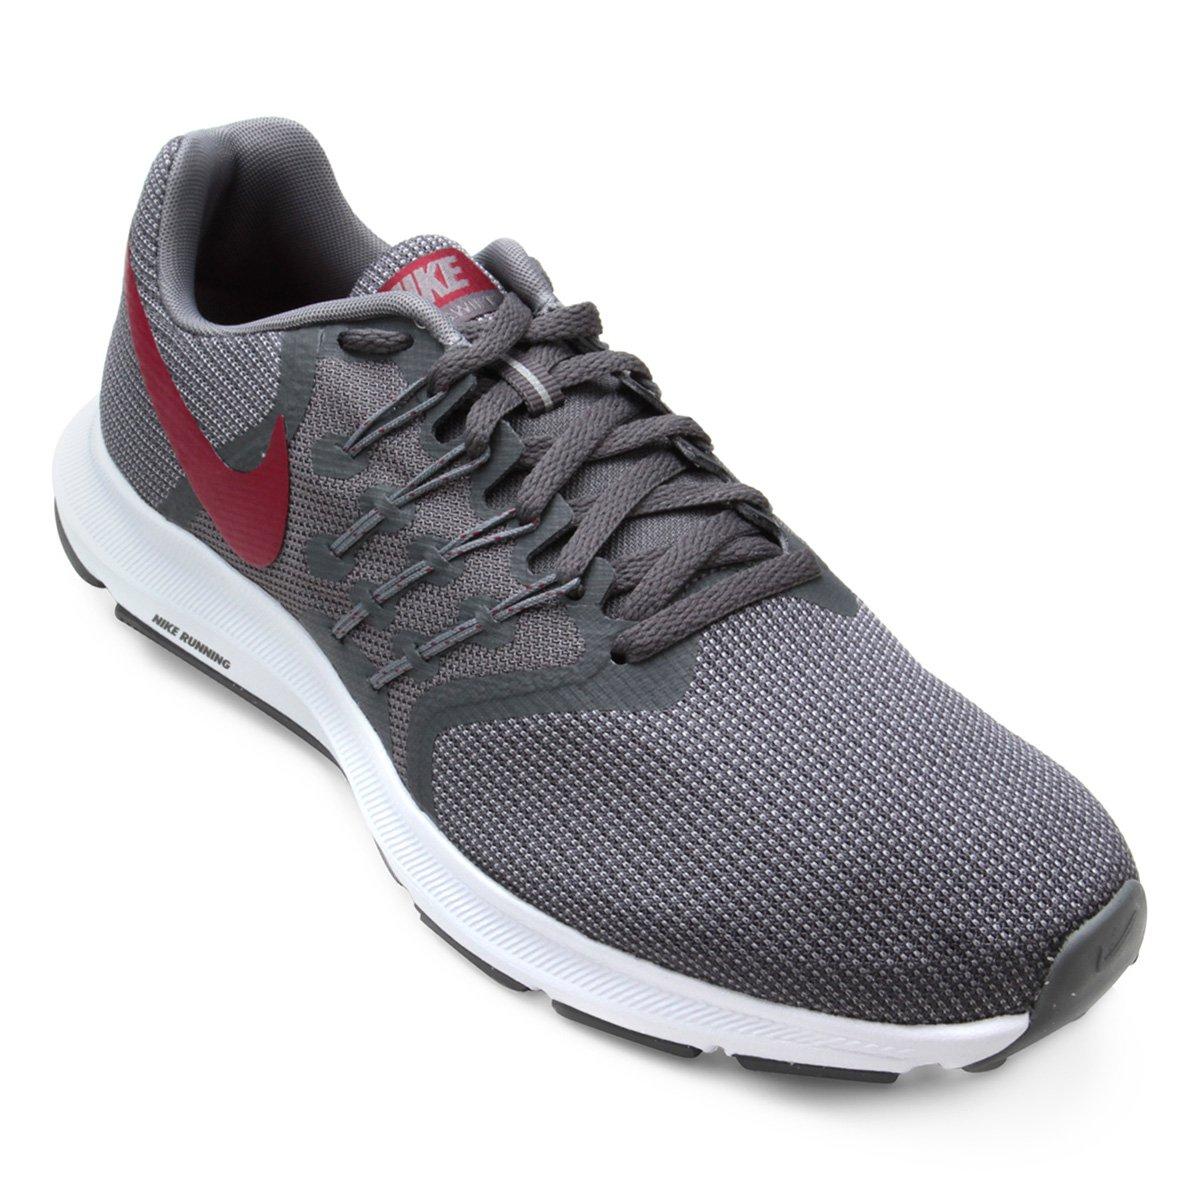 be2b8cdcef5 Tênis Nike Run Swift Masculino - Compre Agora